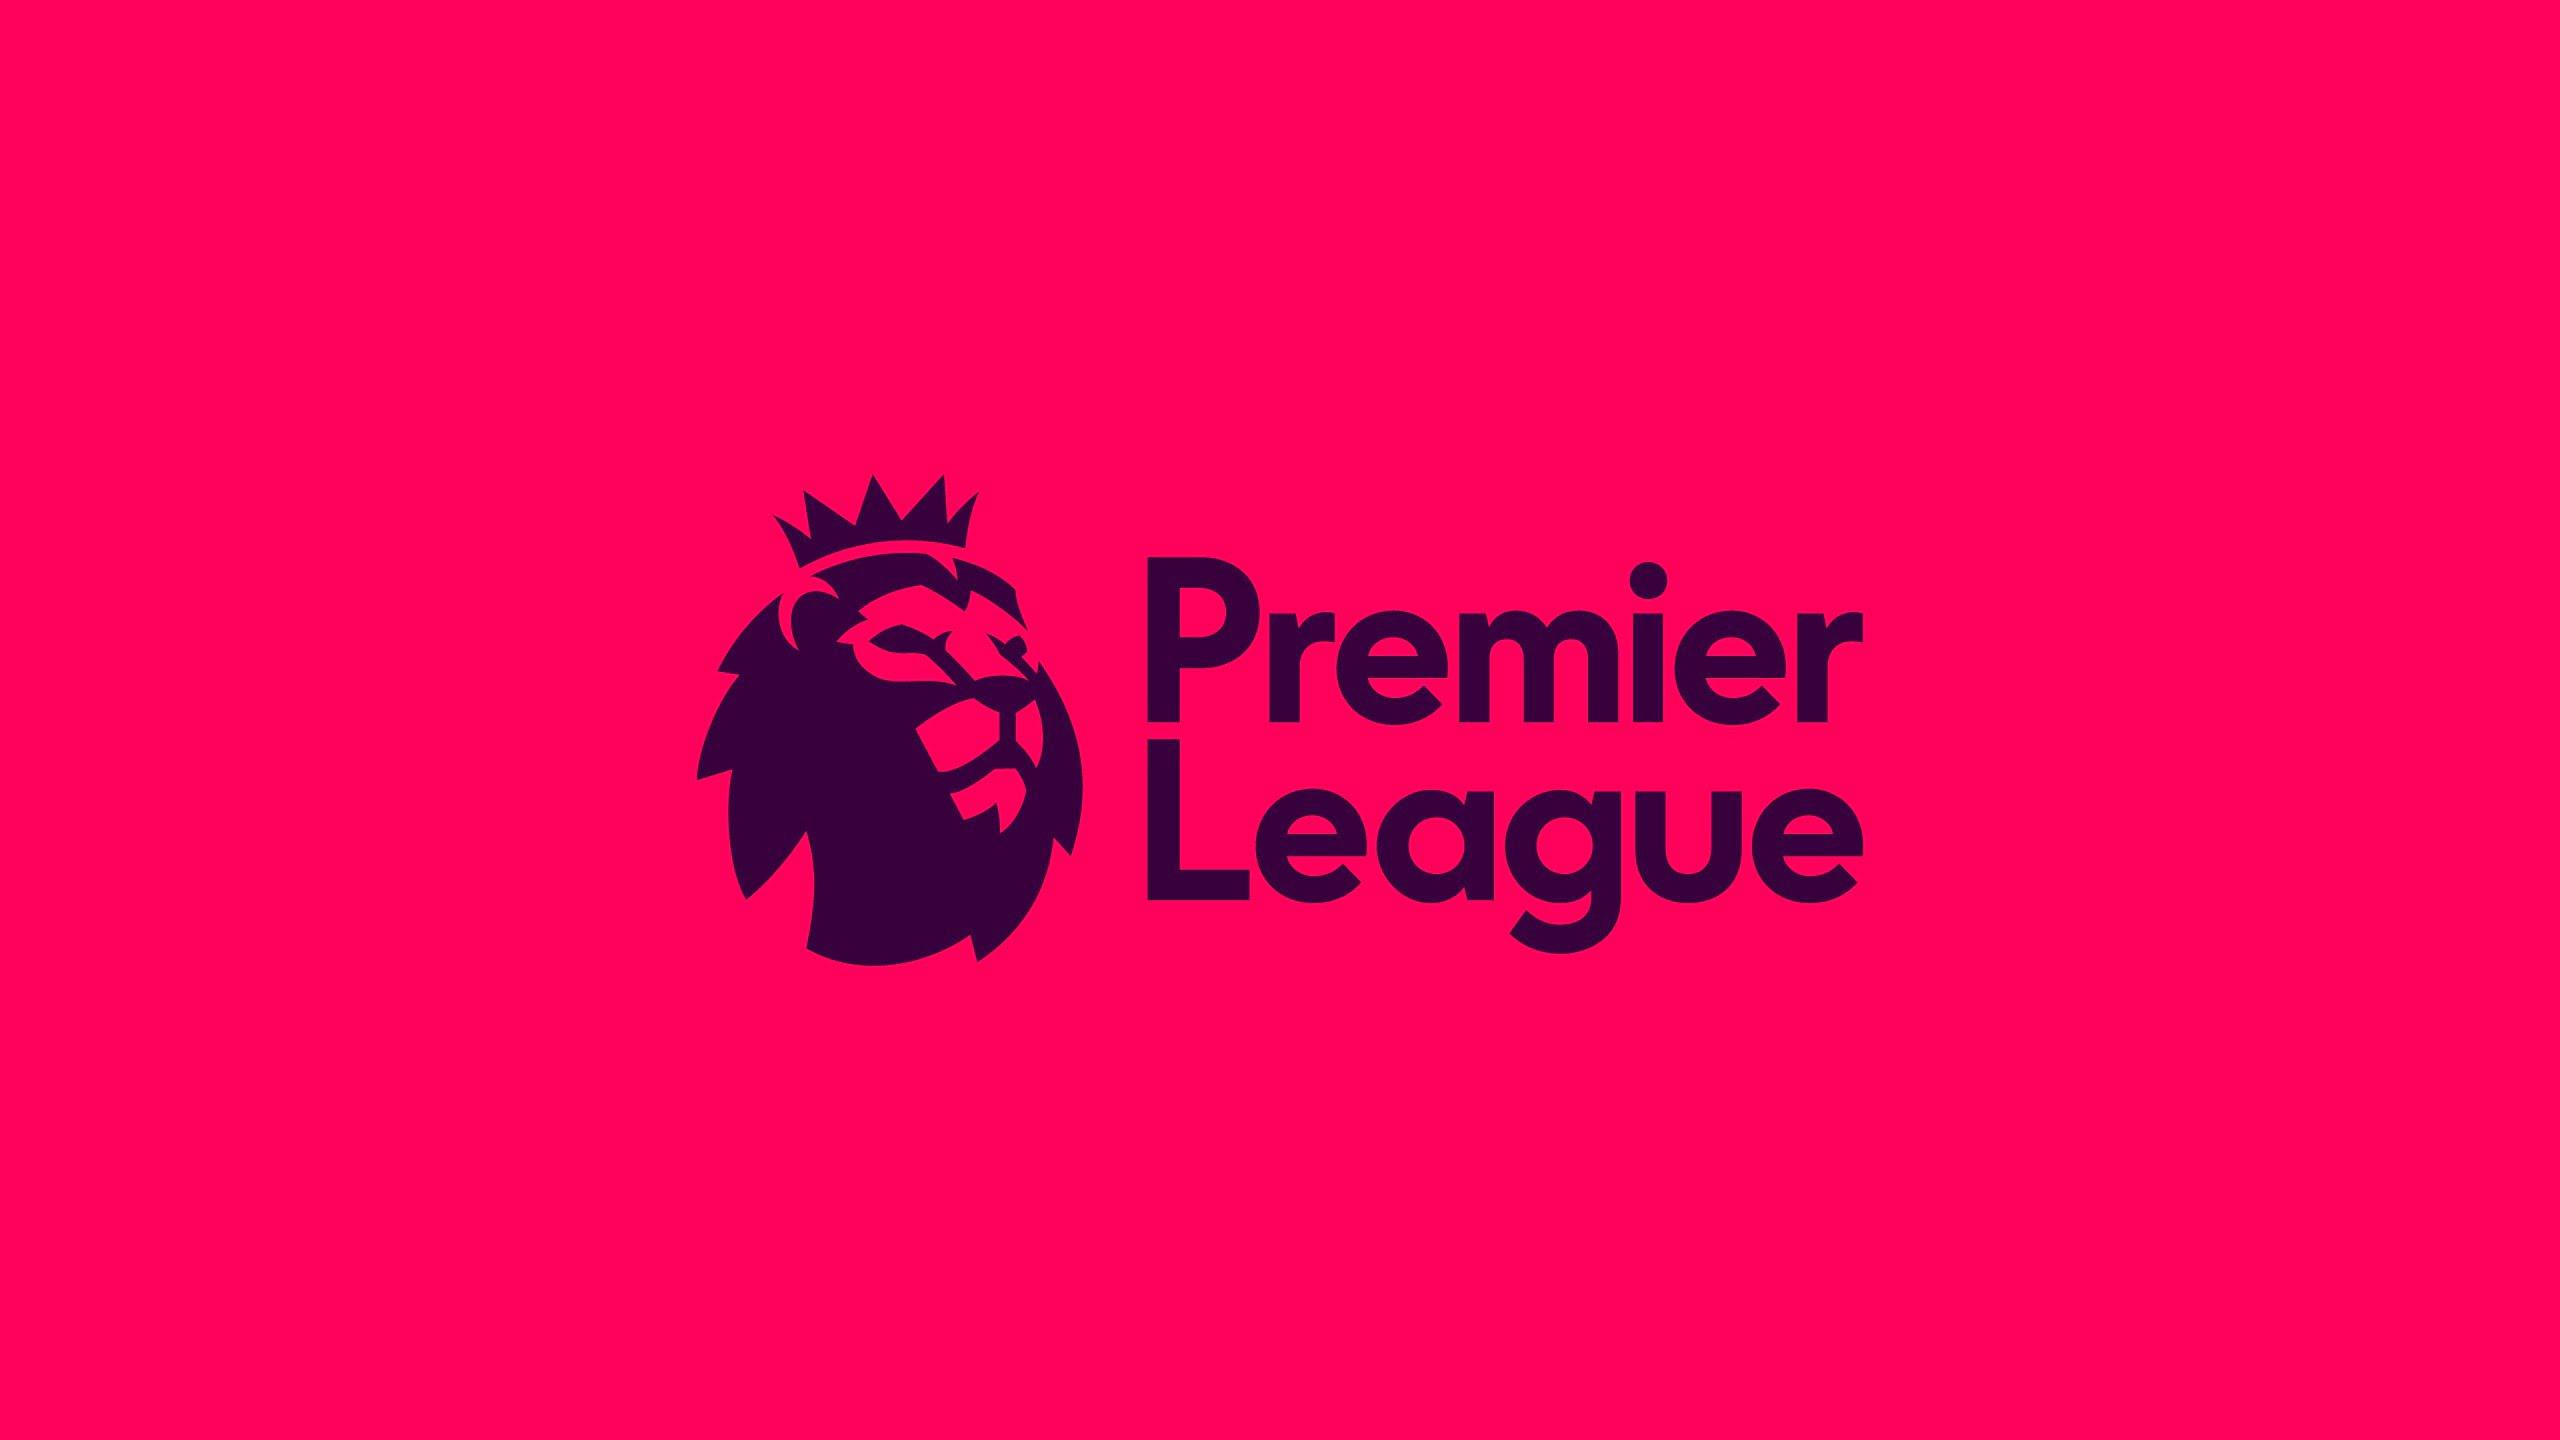 26/01/2021 Daily Predictions: English Premier League – West Bromwich Albion Vs. Manchester City